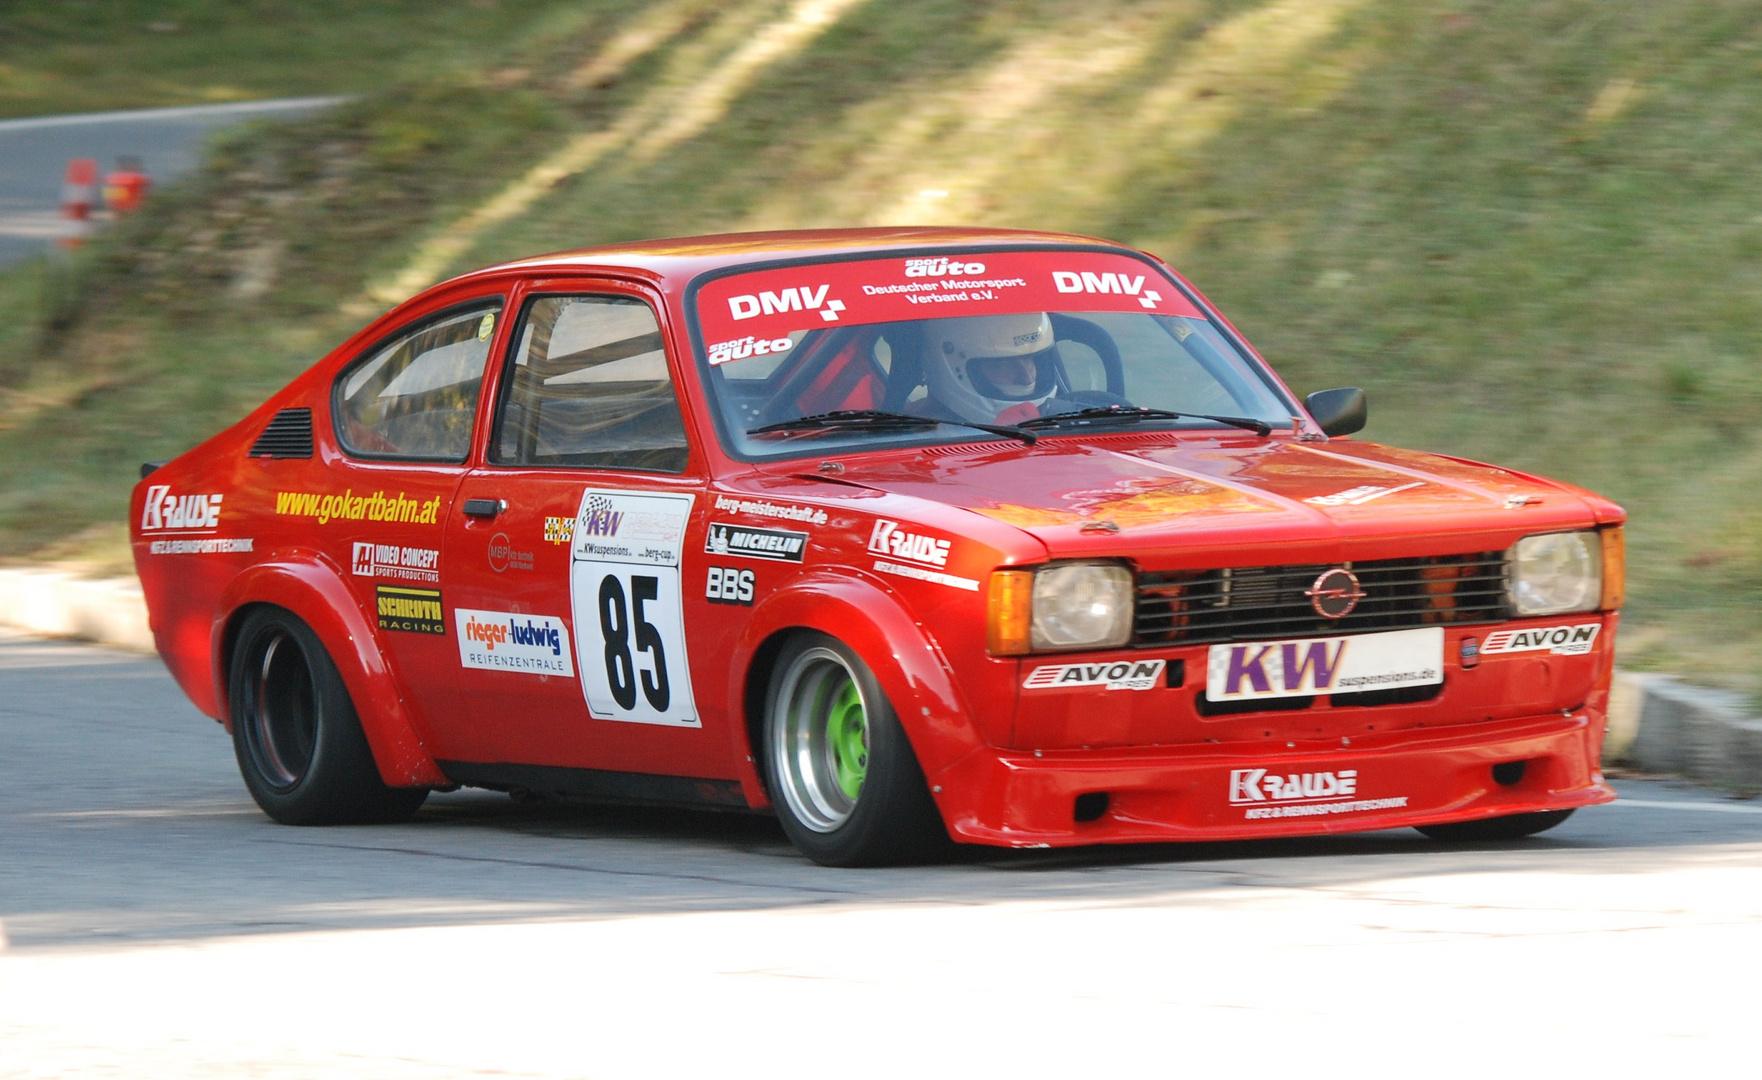 Terler Walter - AUT- Krause Opel Kadett C